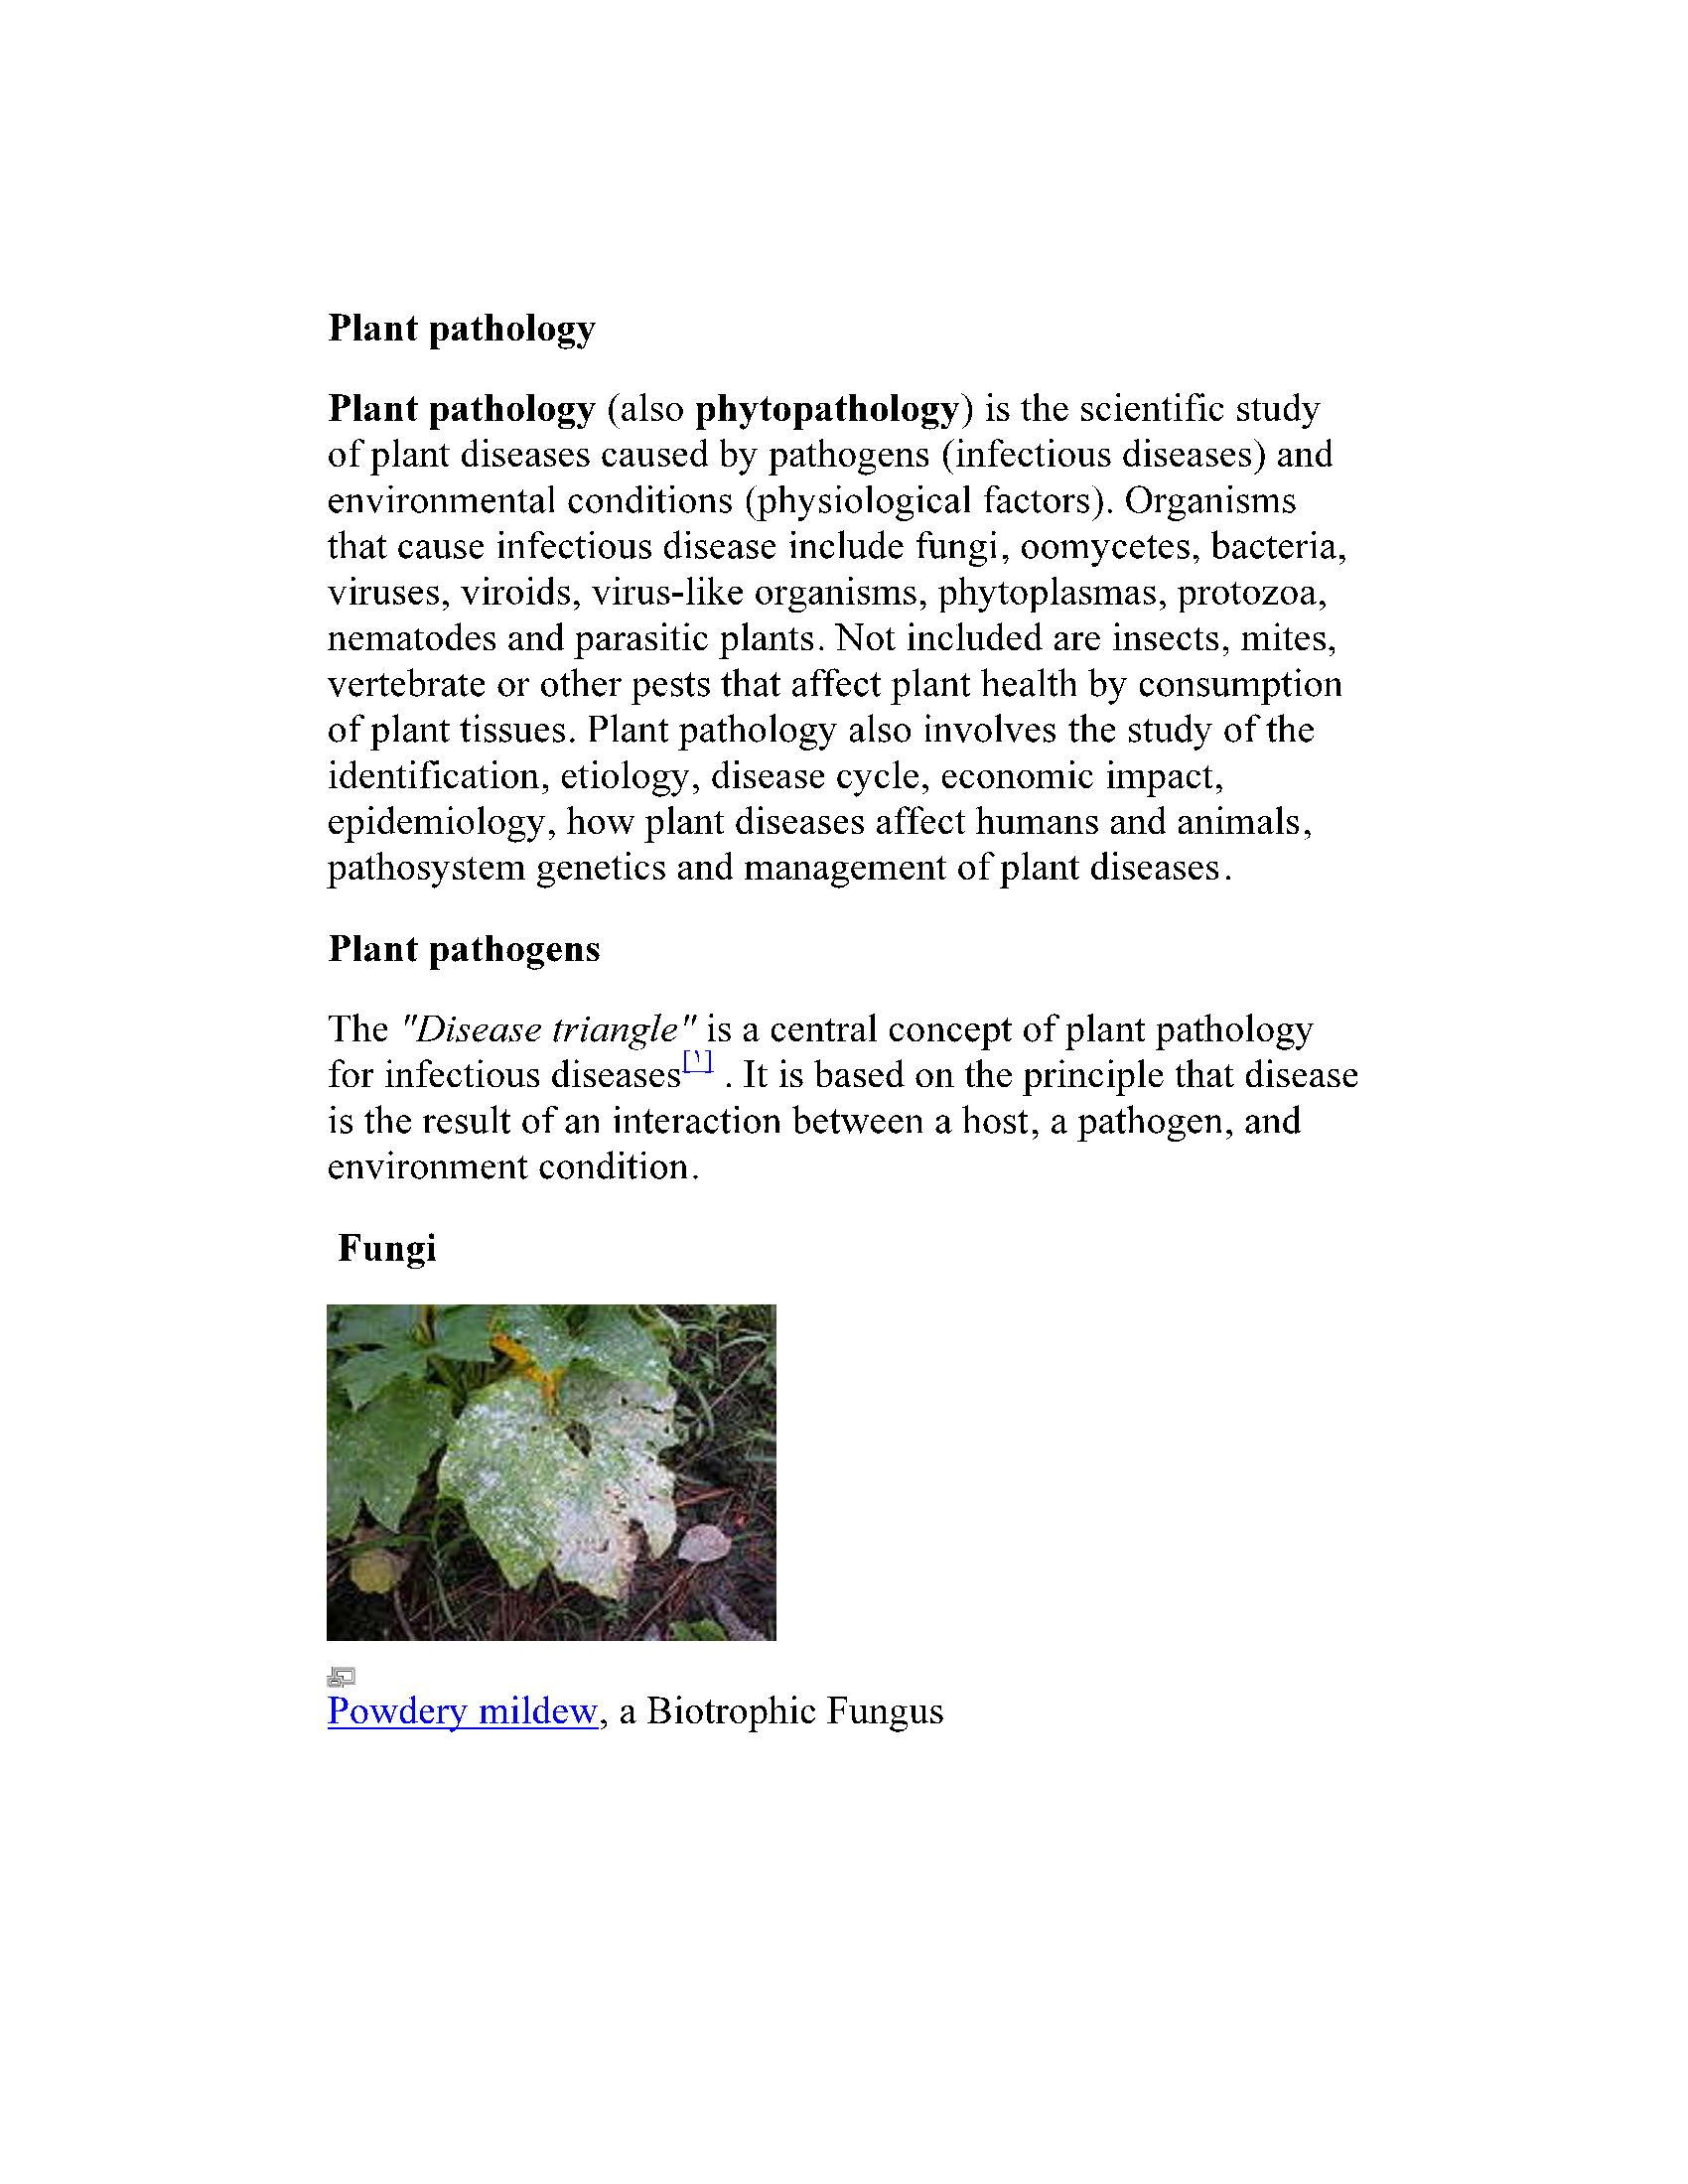 آسیب شناسی گیاهی planet patology